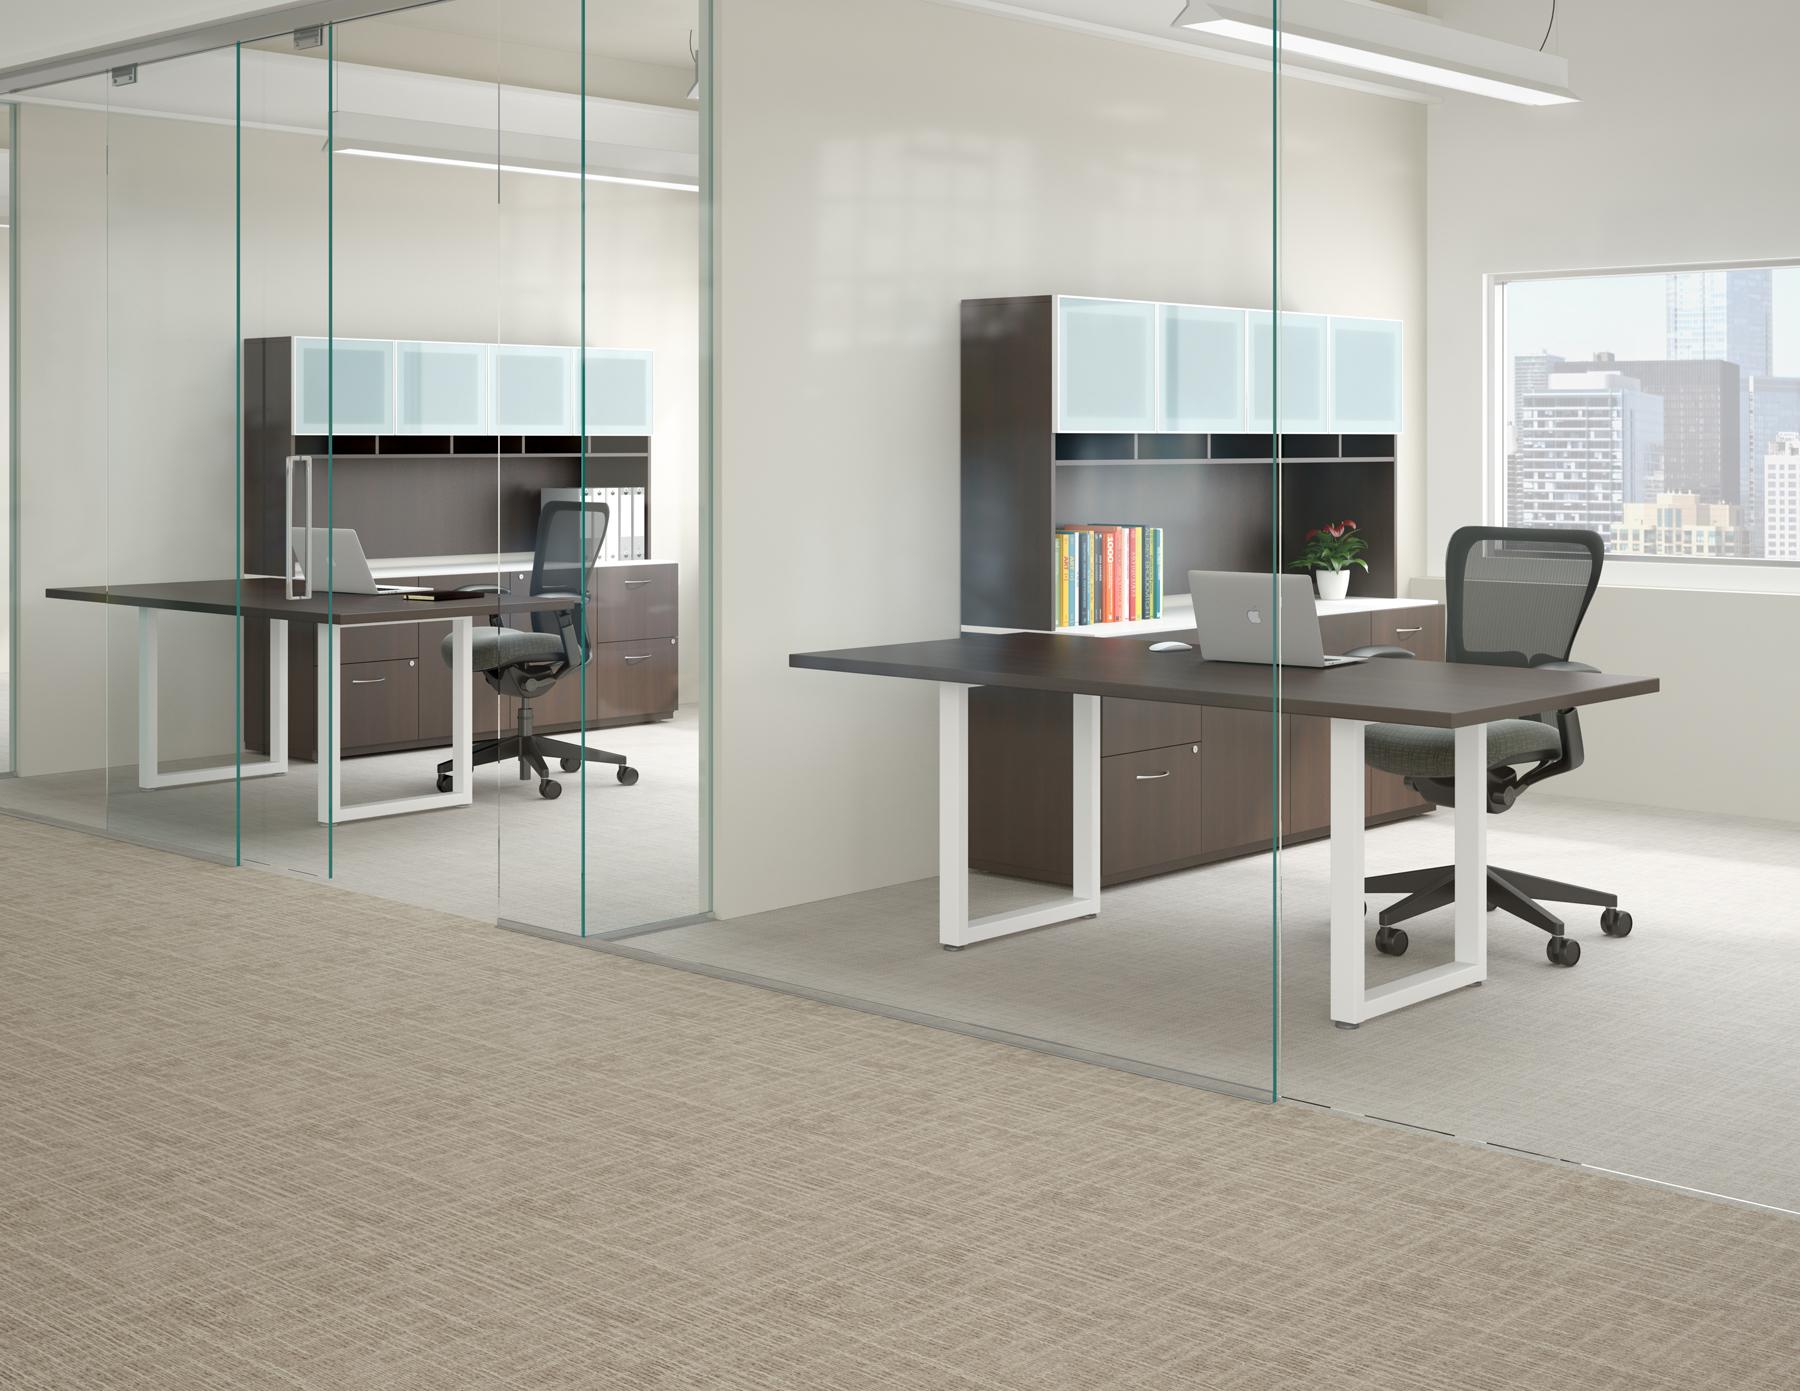 Enwork_Affinity-and-Impression-O-leg-Glass-Offices-A4G_1014.jpg